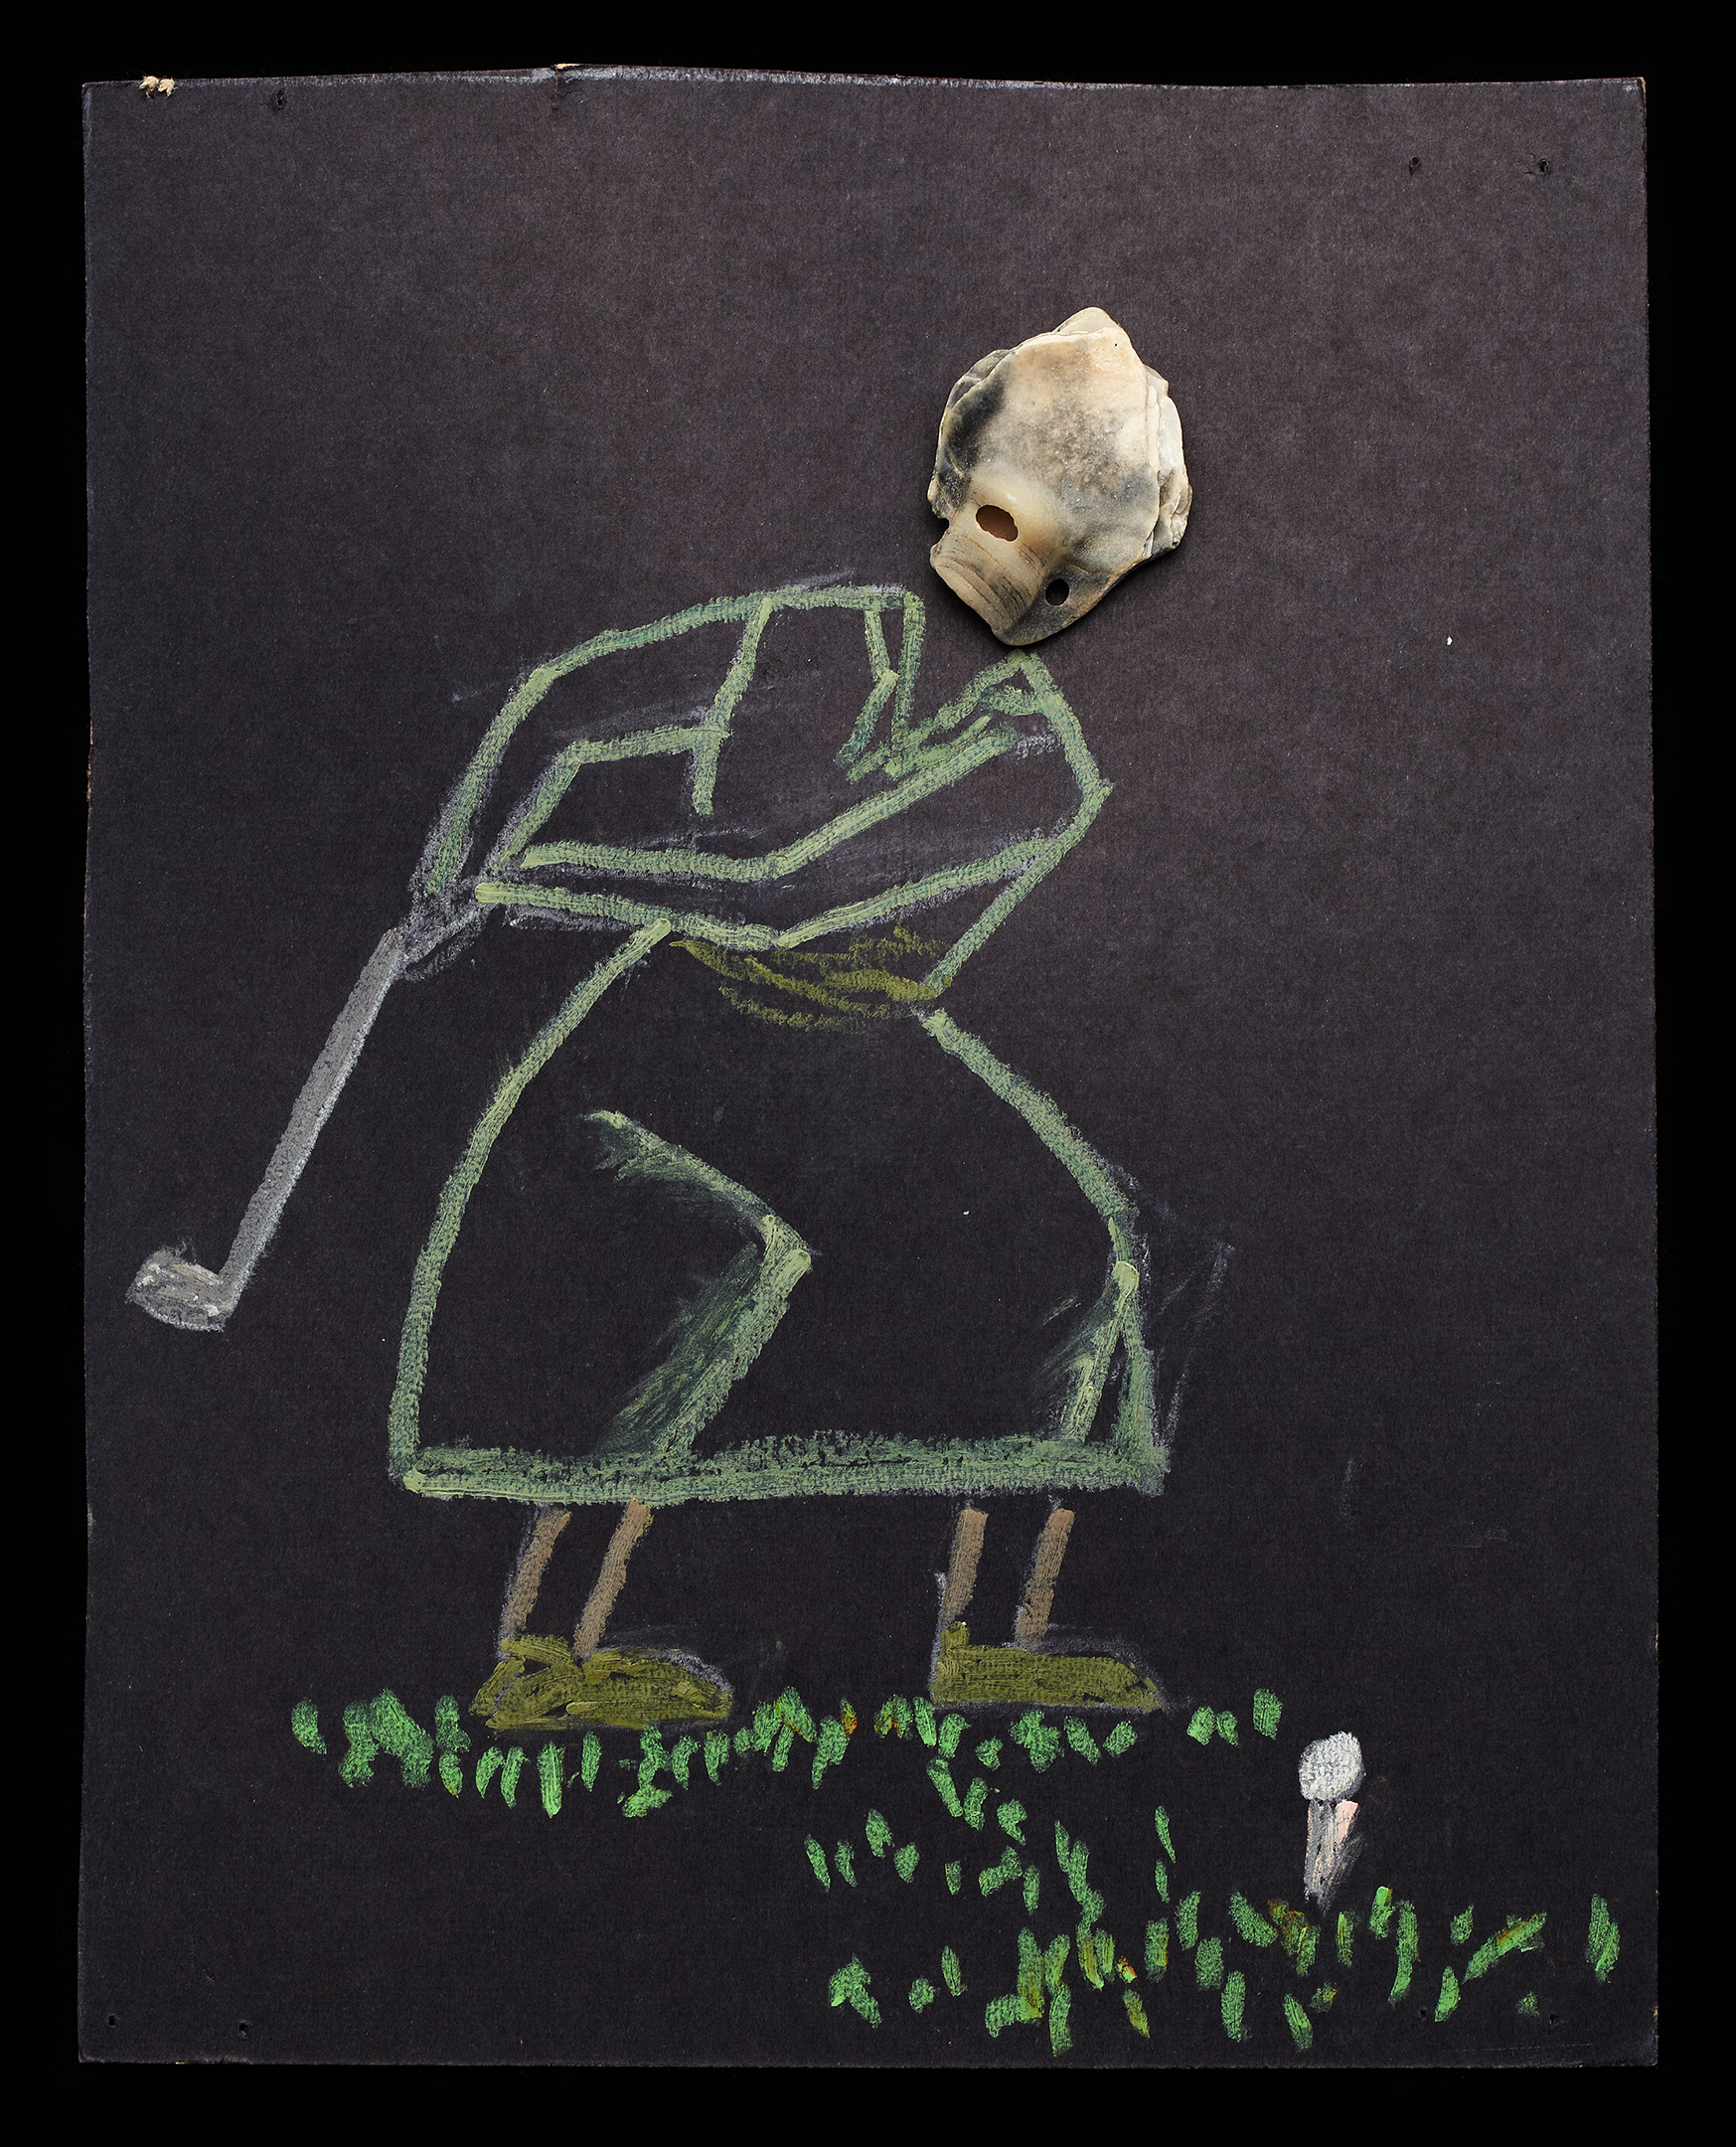 ShellArt-Golfer by Thomas Wilson Laney